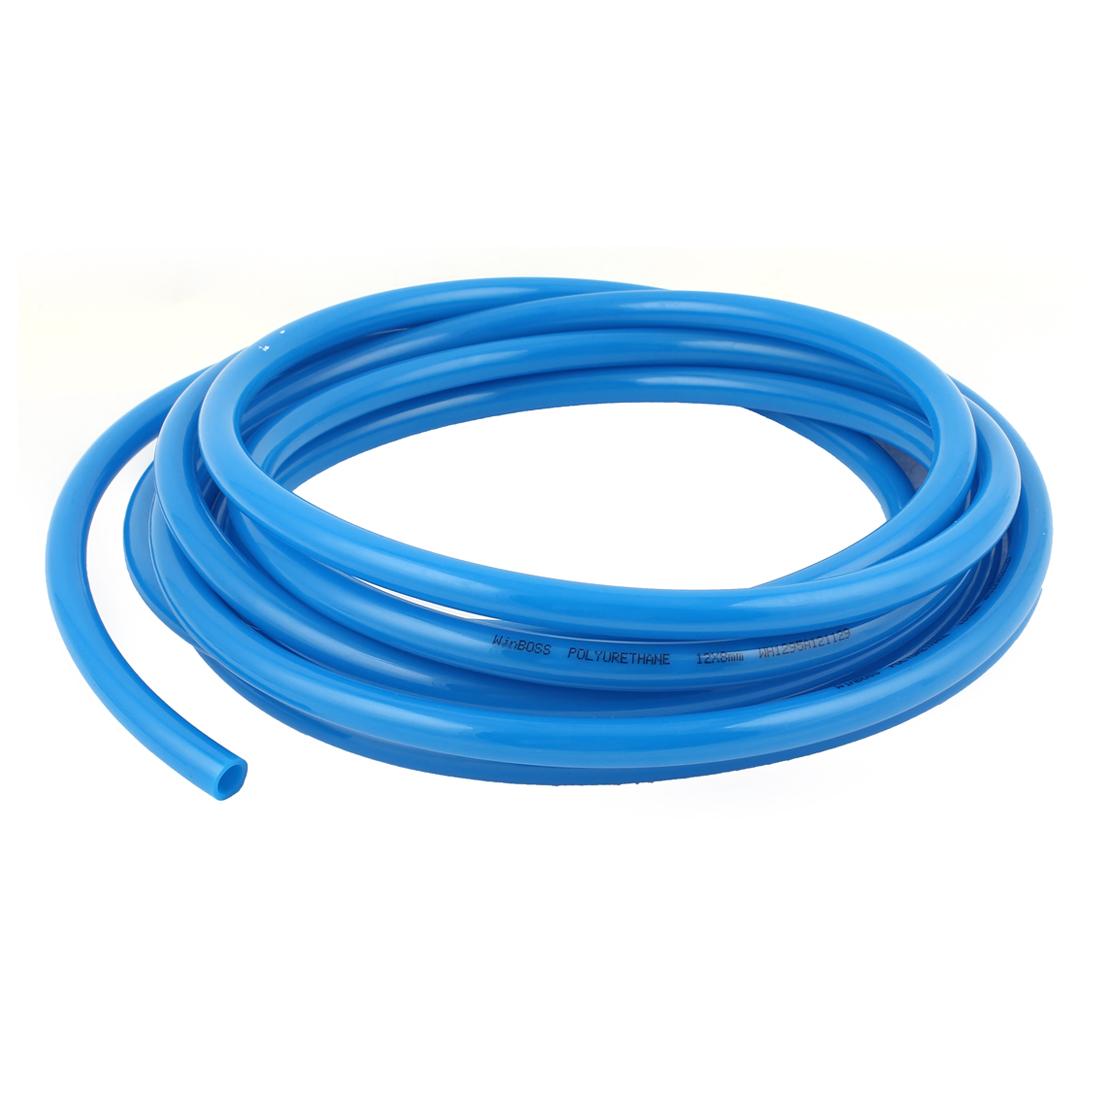 12mm OD x 8mm ID Polyurethane PU Pneumatic Air Tubing Pipe Hose 6M 20ft Blue